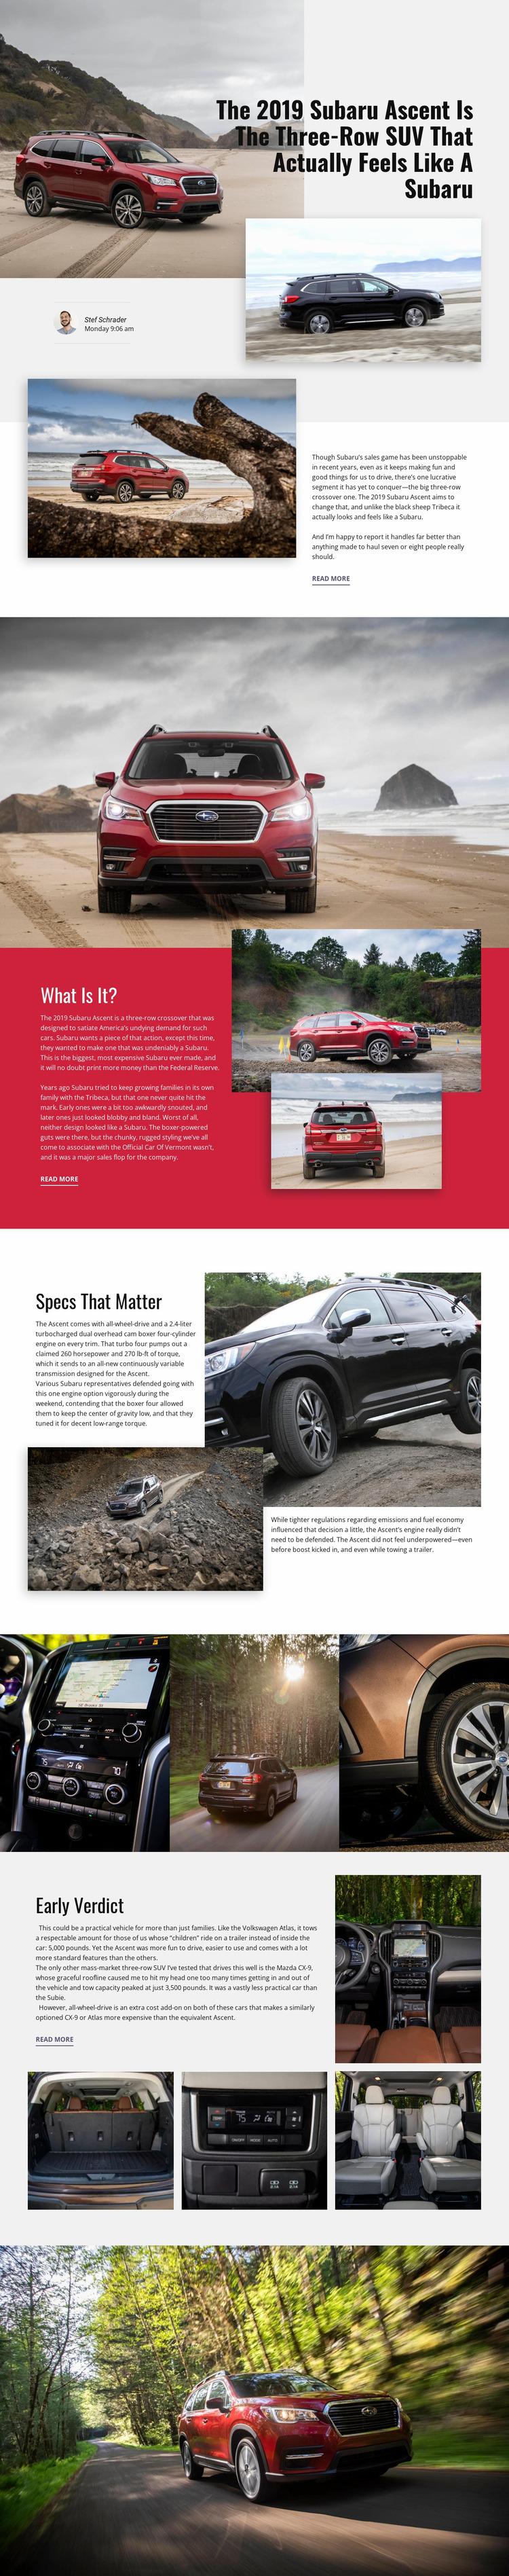 Subaru Website Mockup